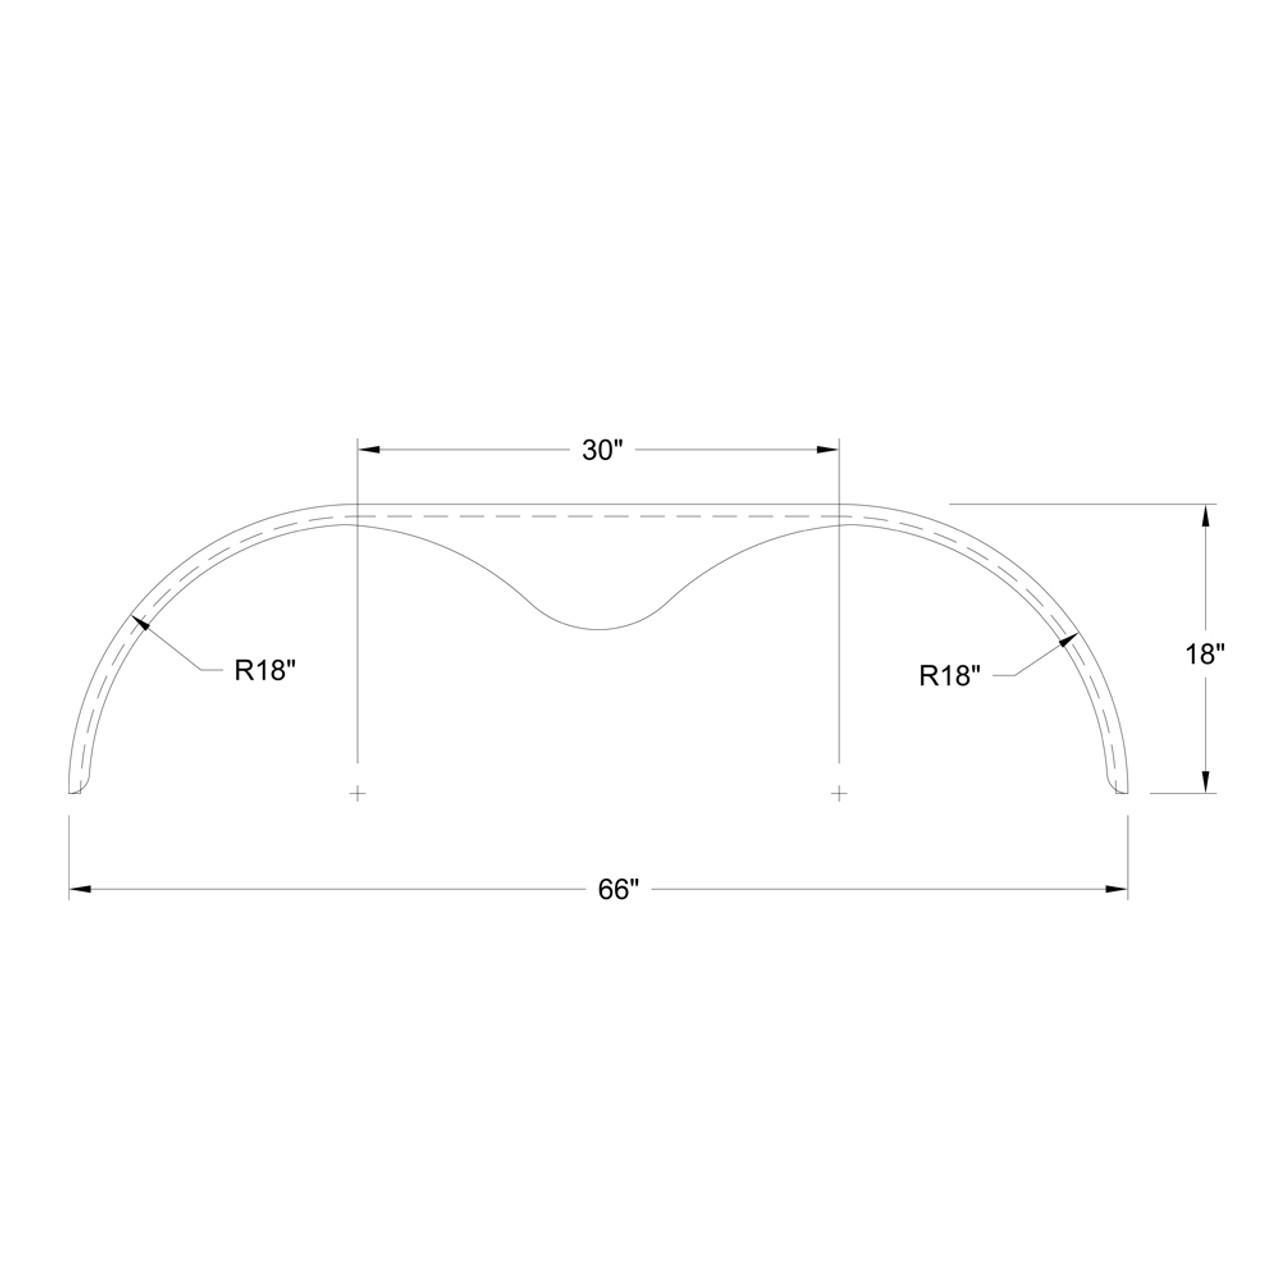 66x9 Smooth Aluminum Tandem-Axle Teardrop Trailer Fender - One Fender